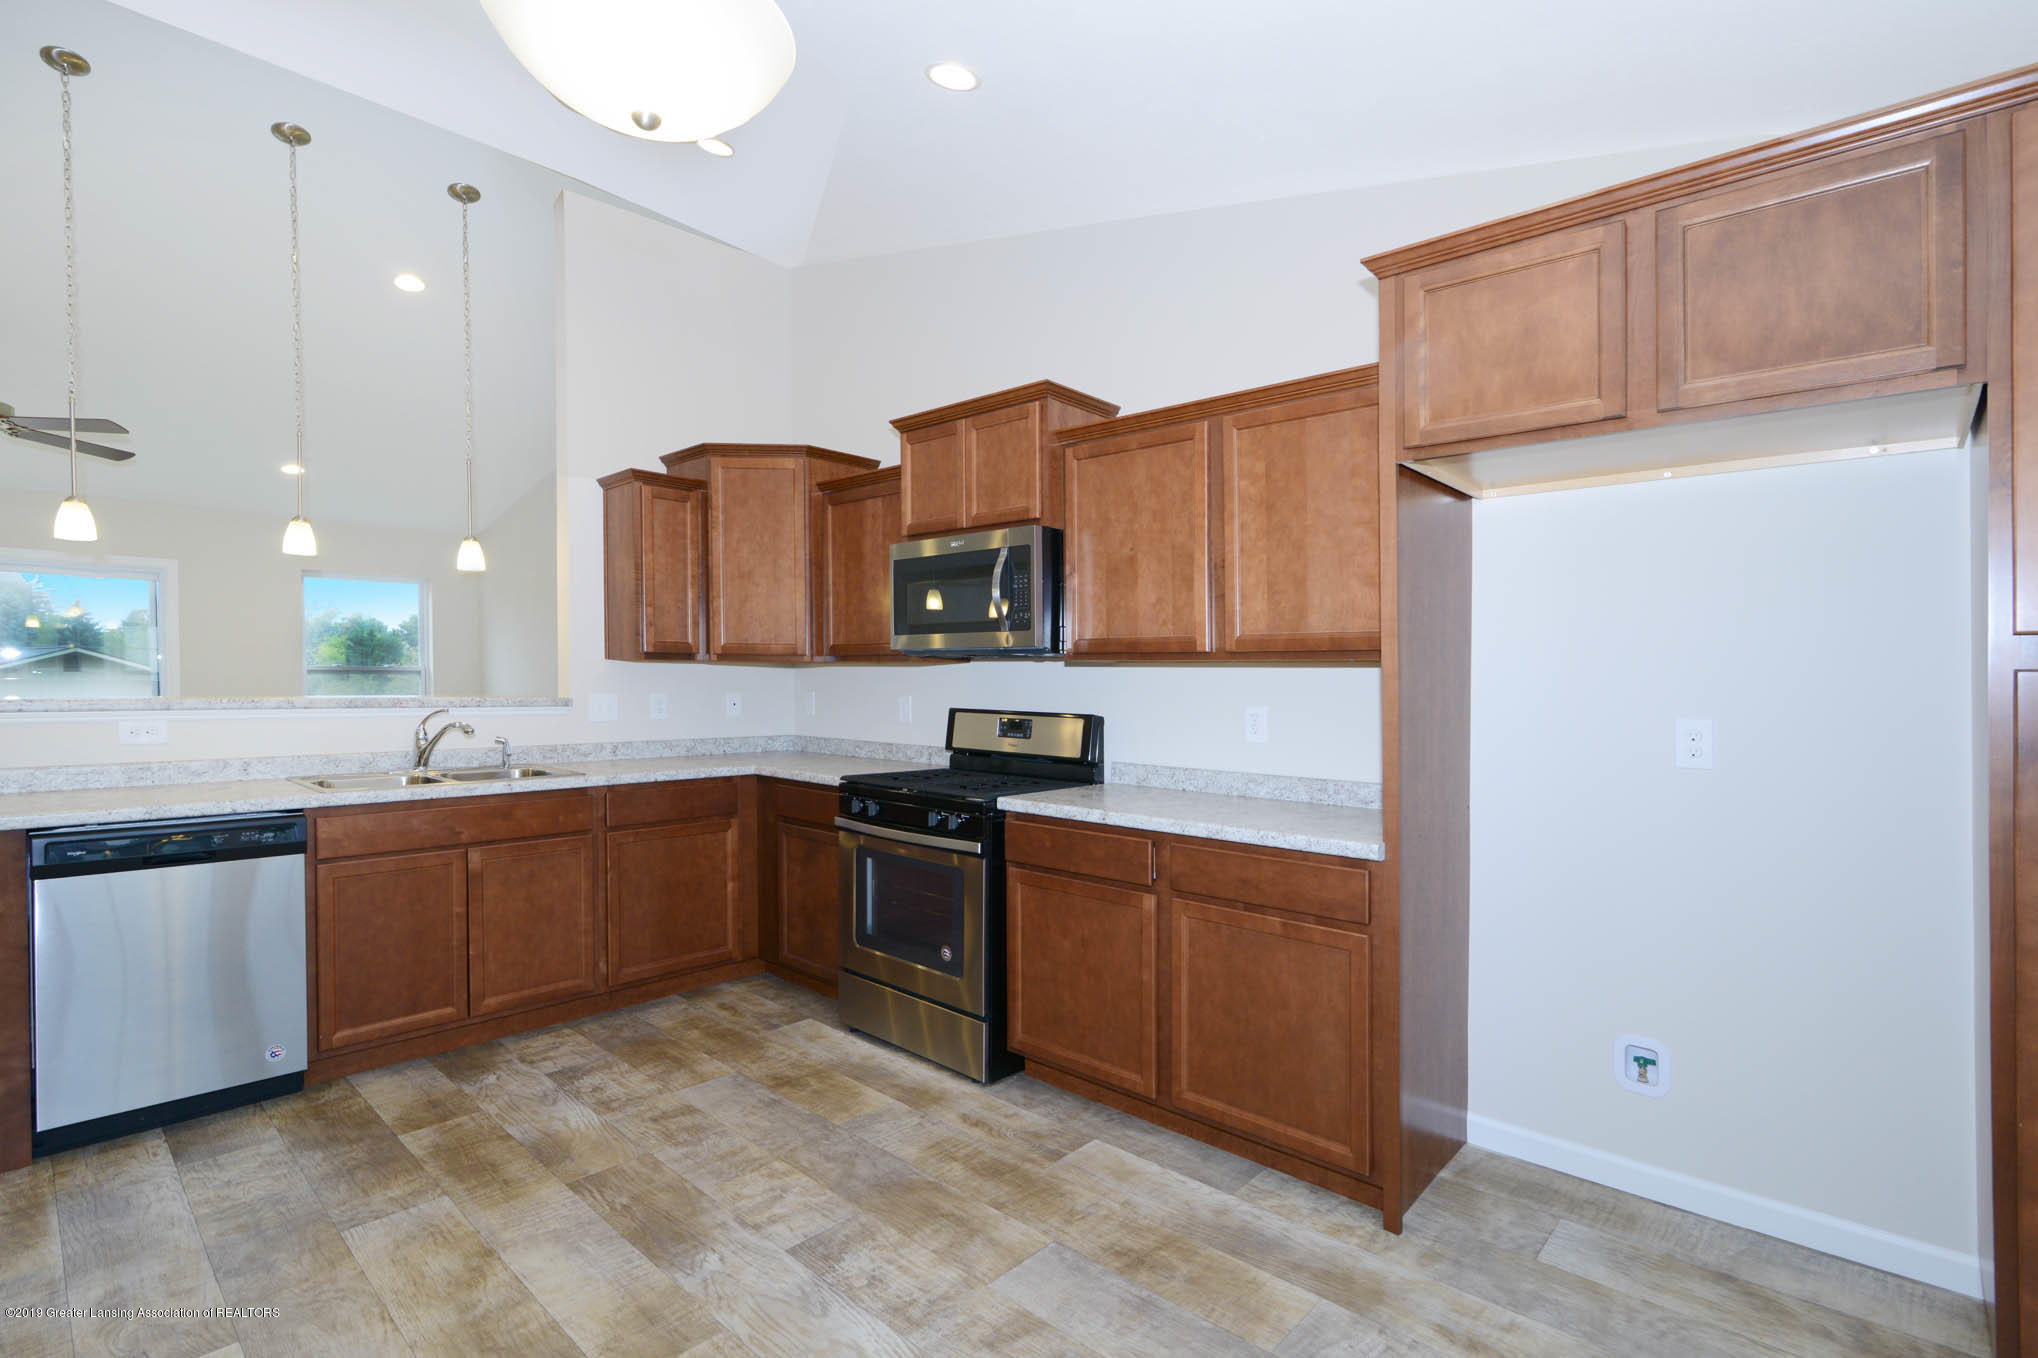 3532 Fernwood Ln - GDN069-C2040-Kitchen-2 - 4